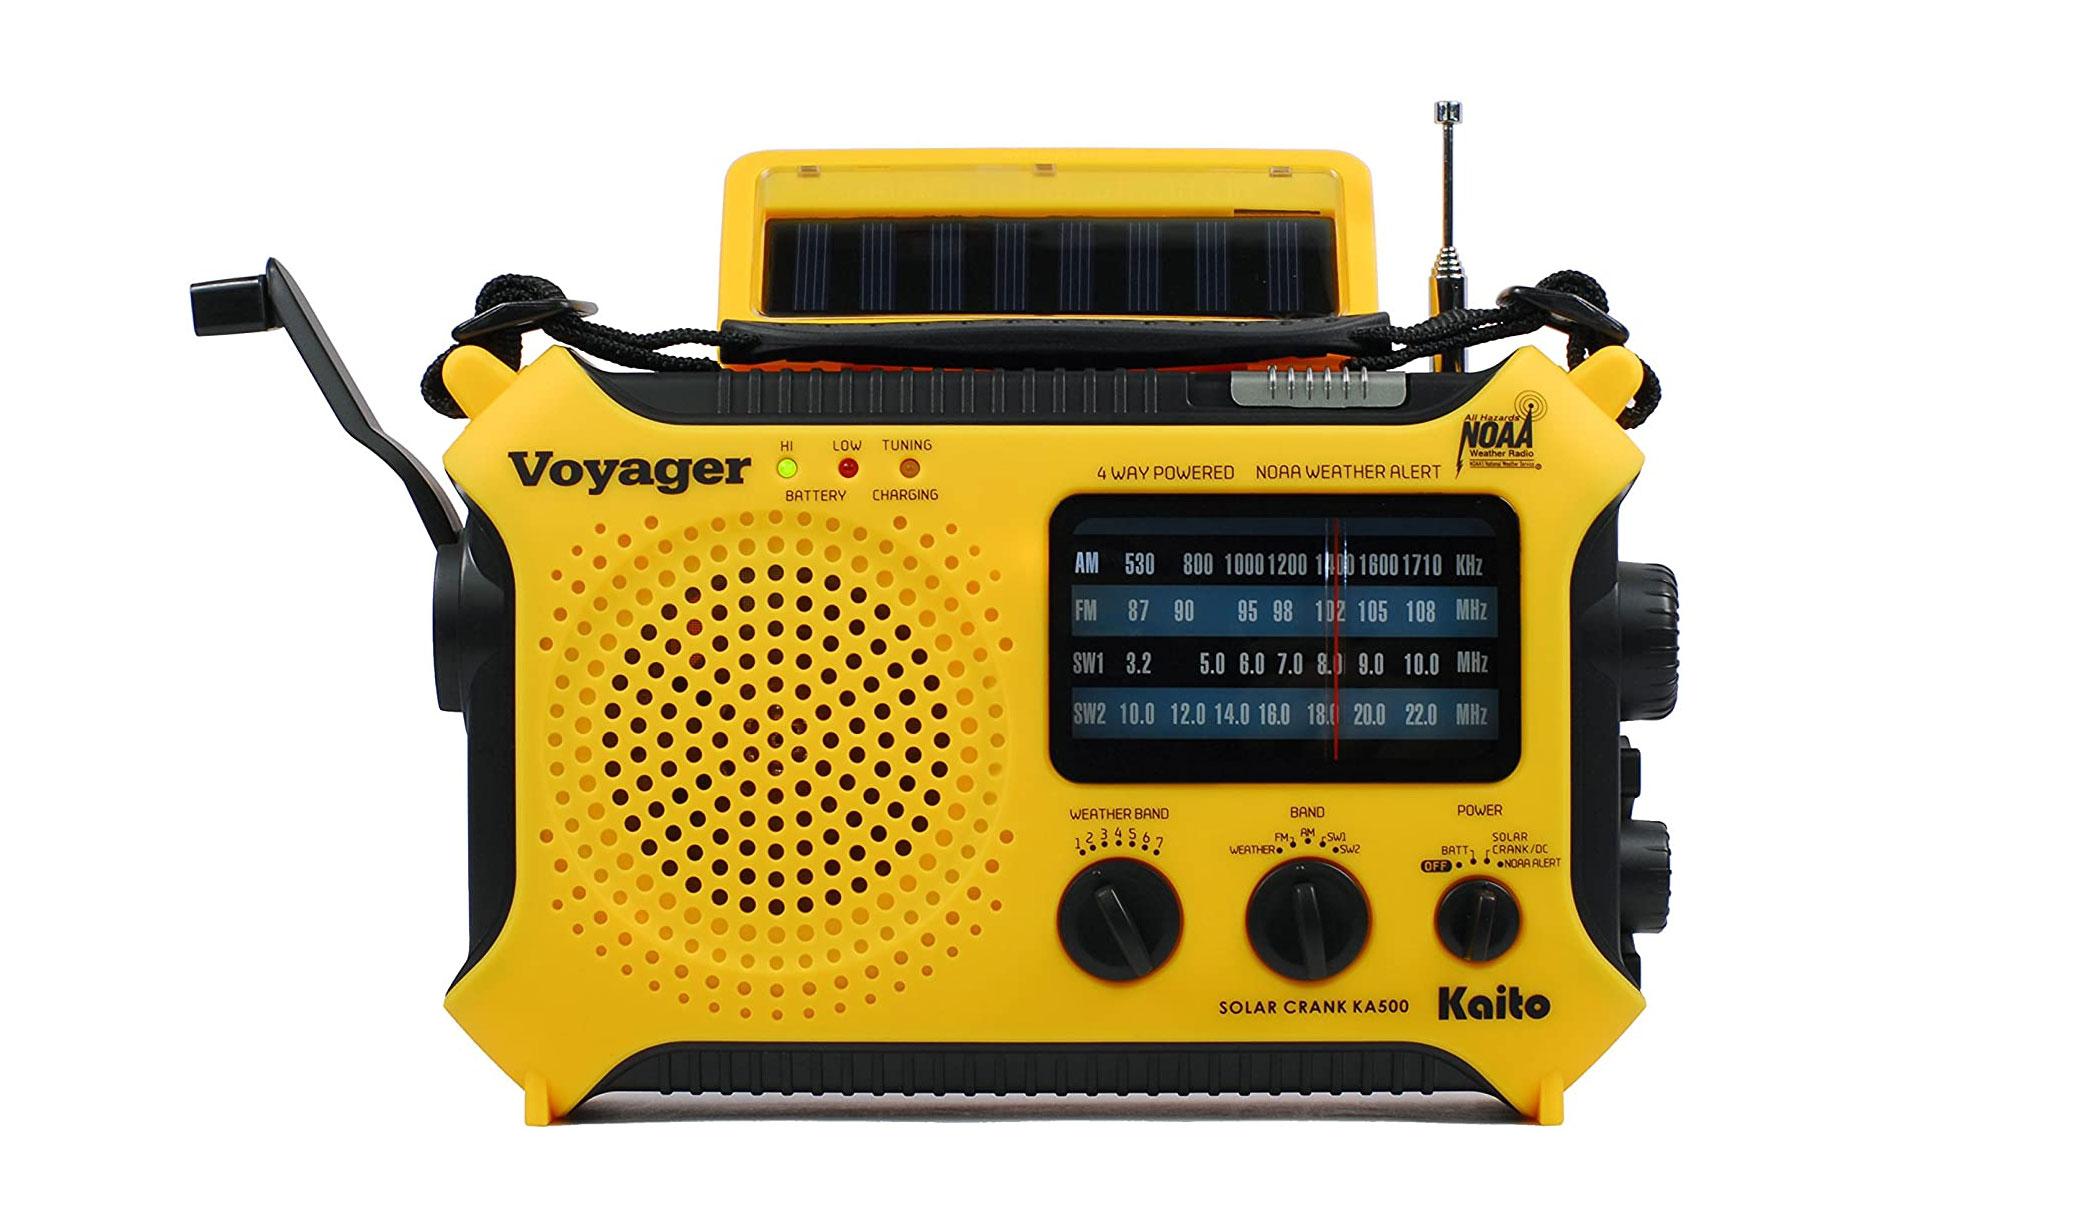 Kaito Ka500 Voyager Emergency Radio